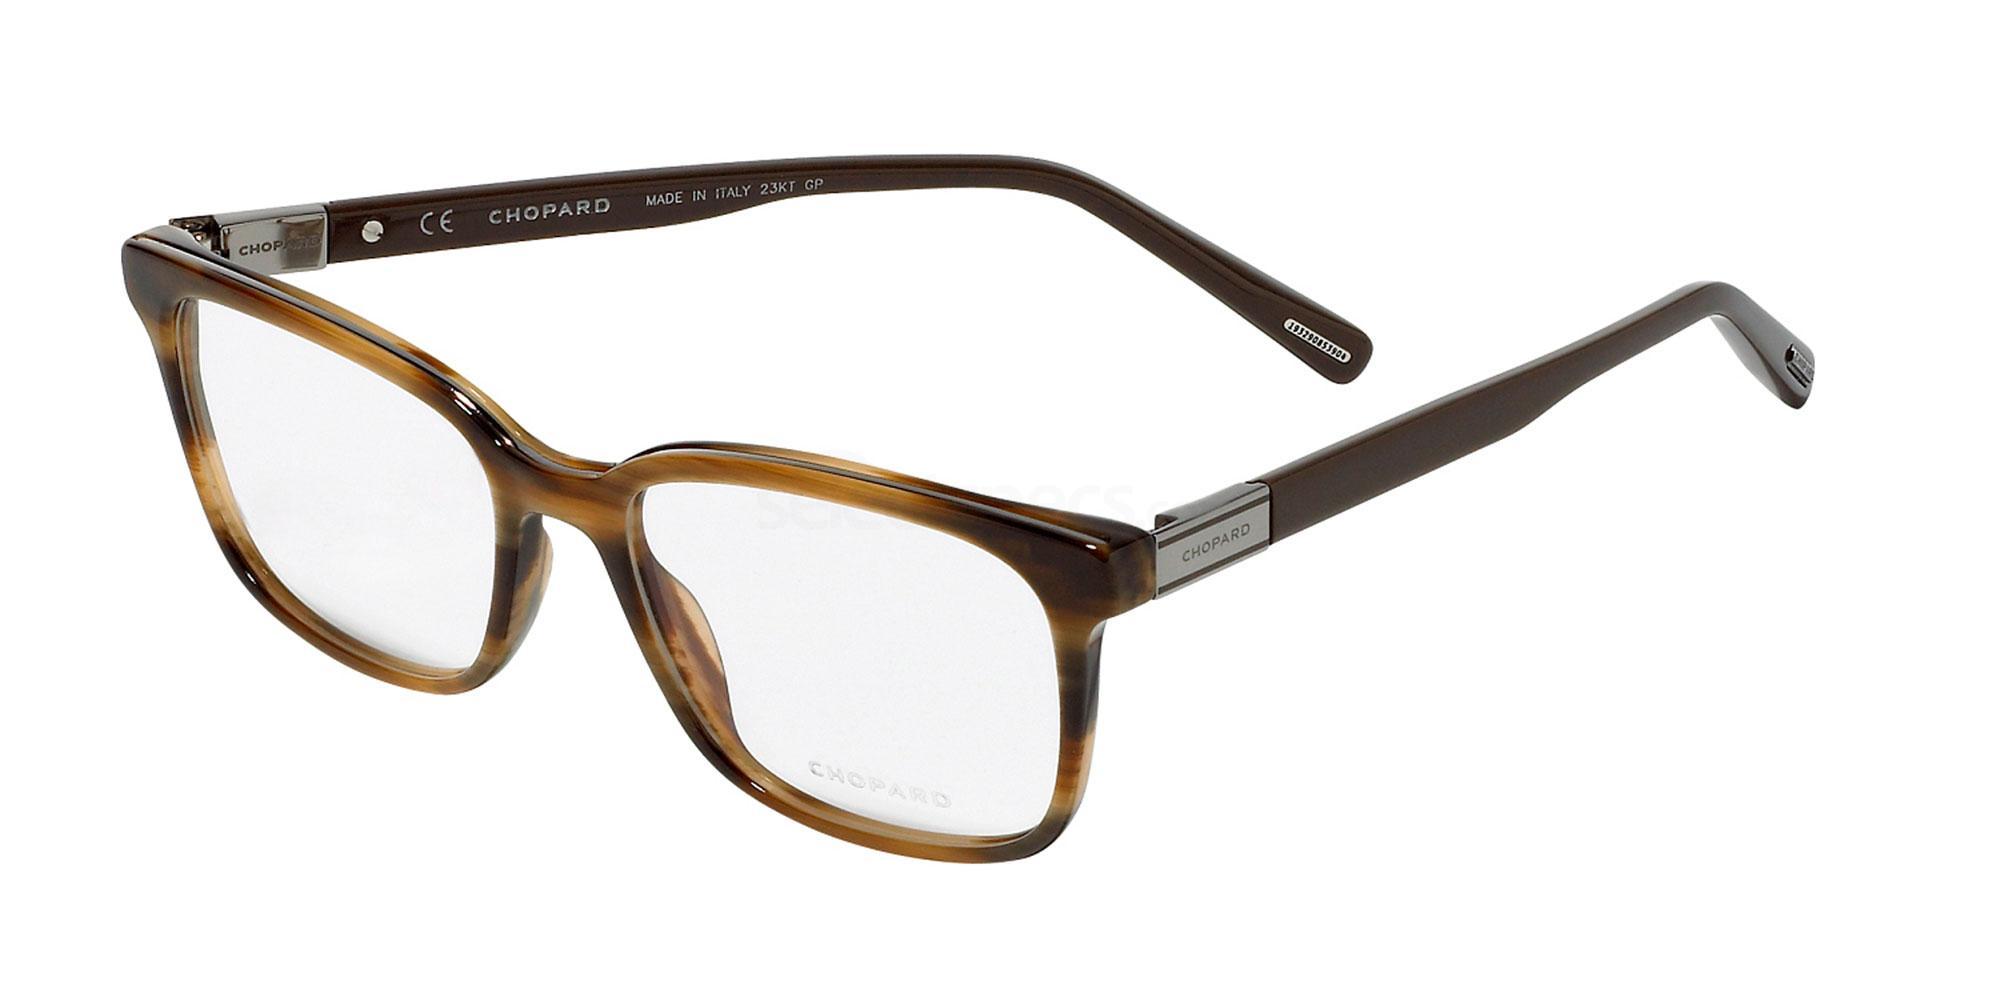 06XE VCH251 Glasses, Chopard